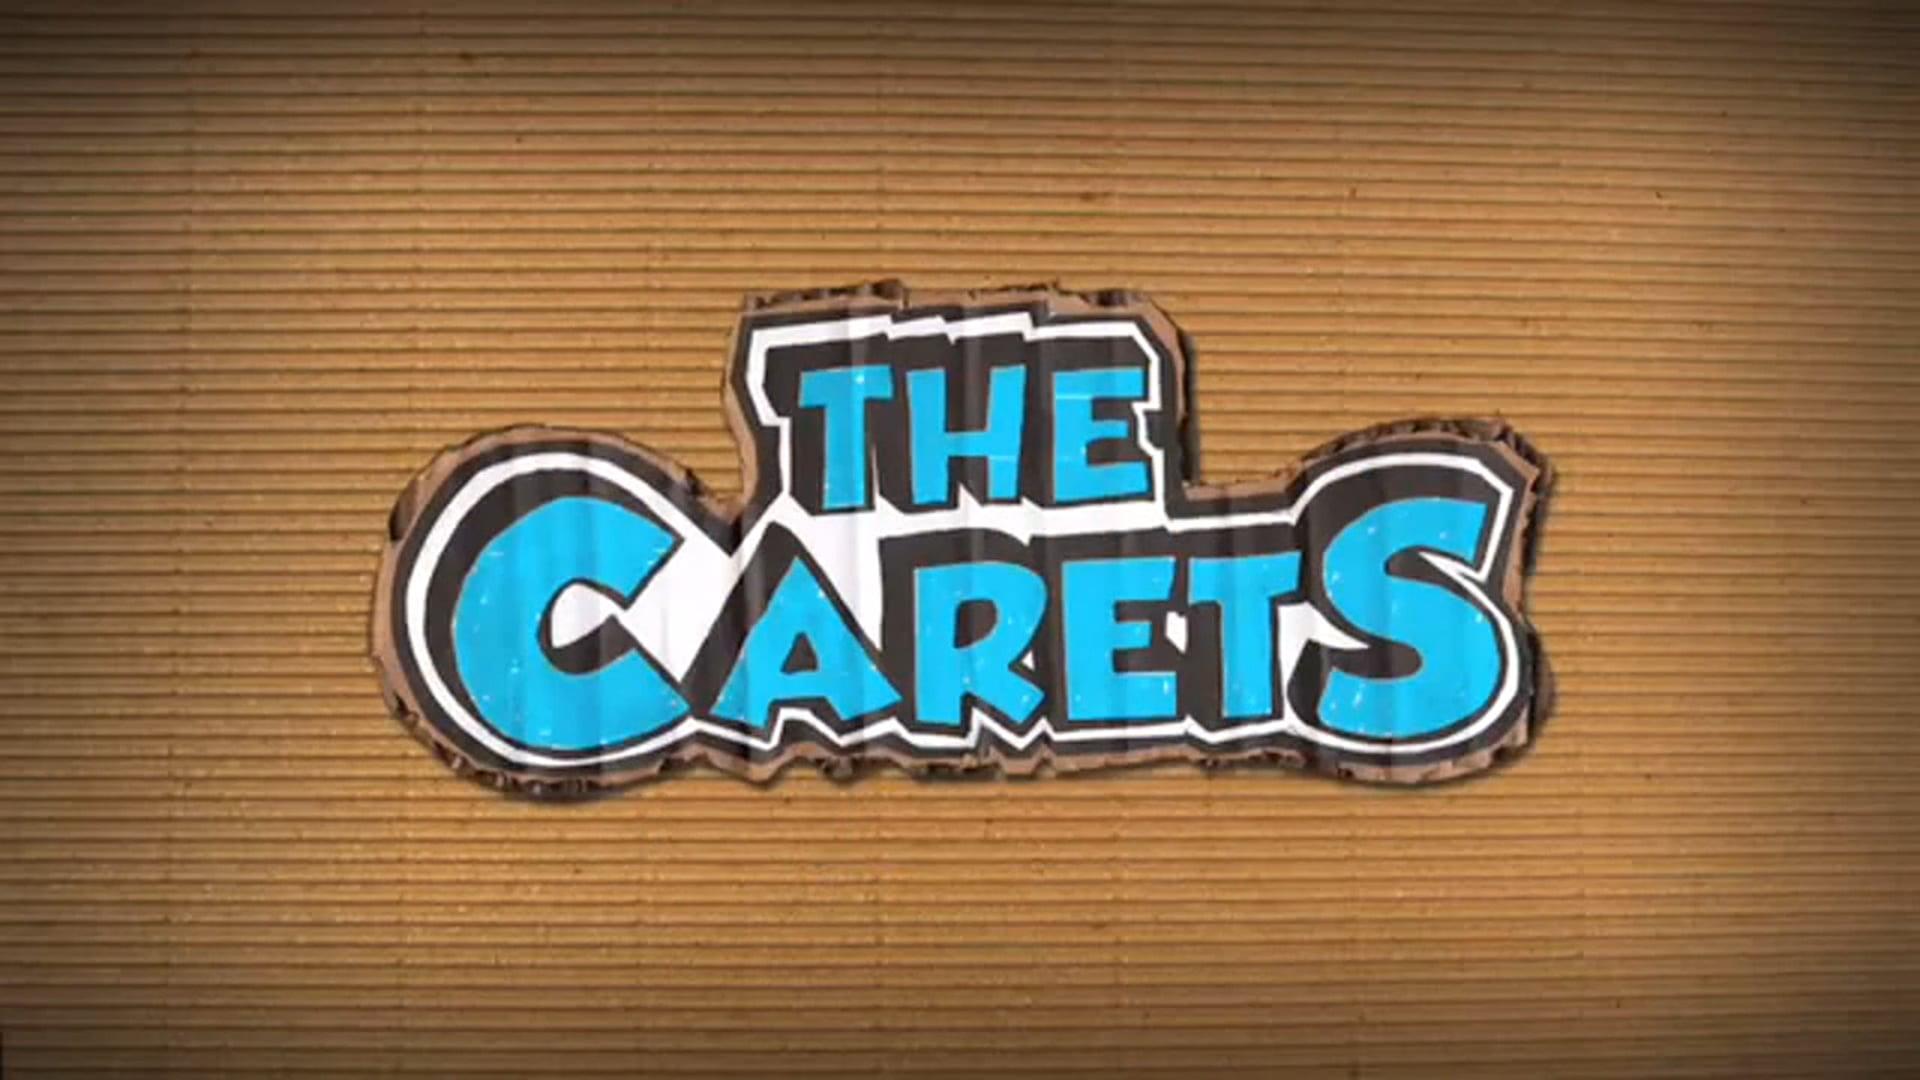 THE CARETS